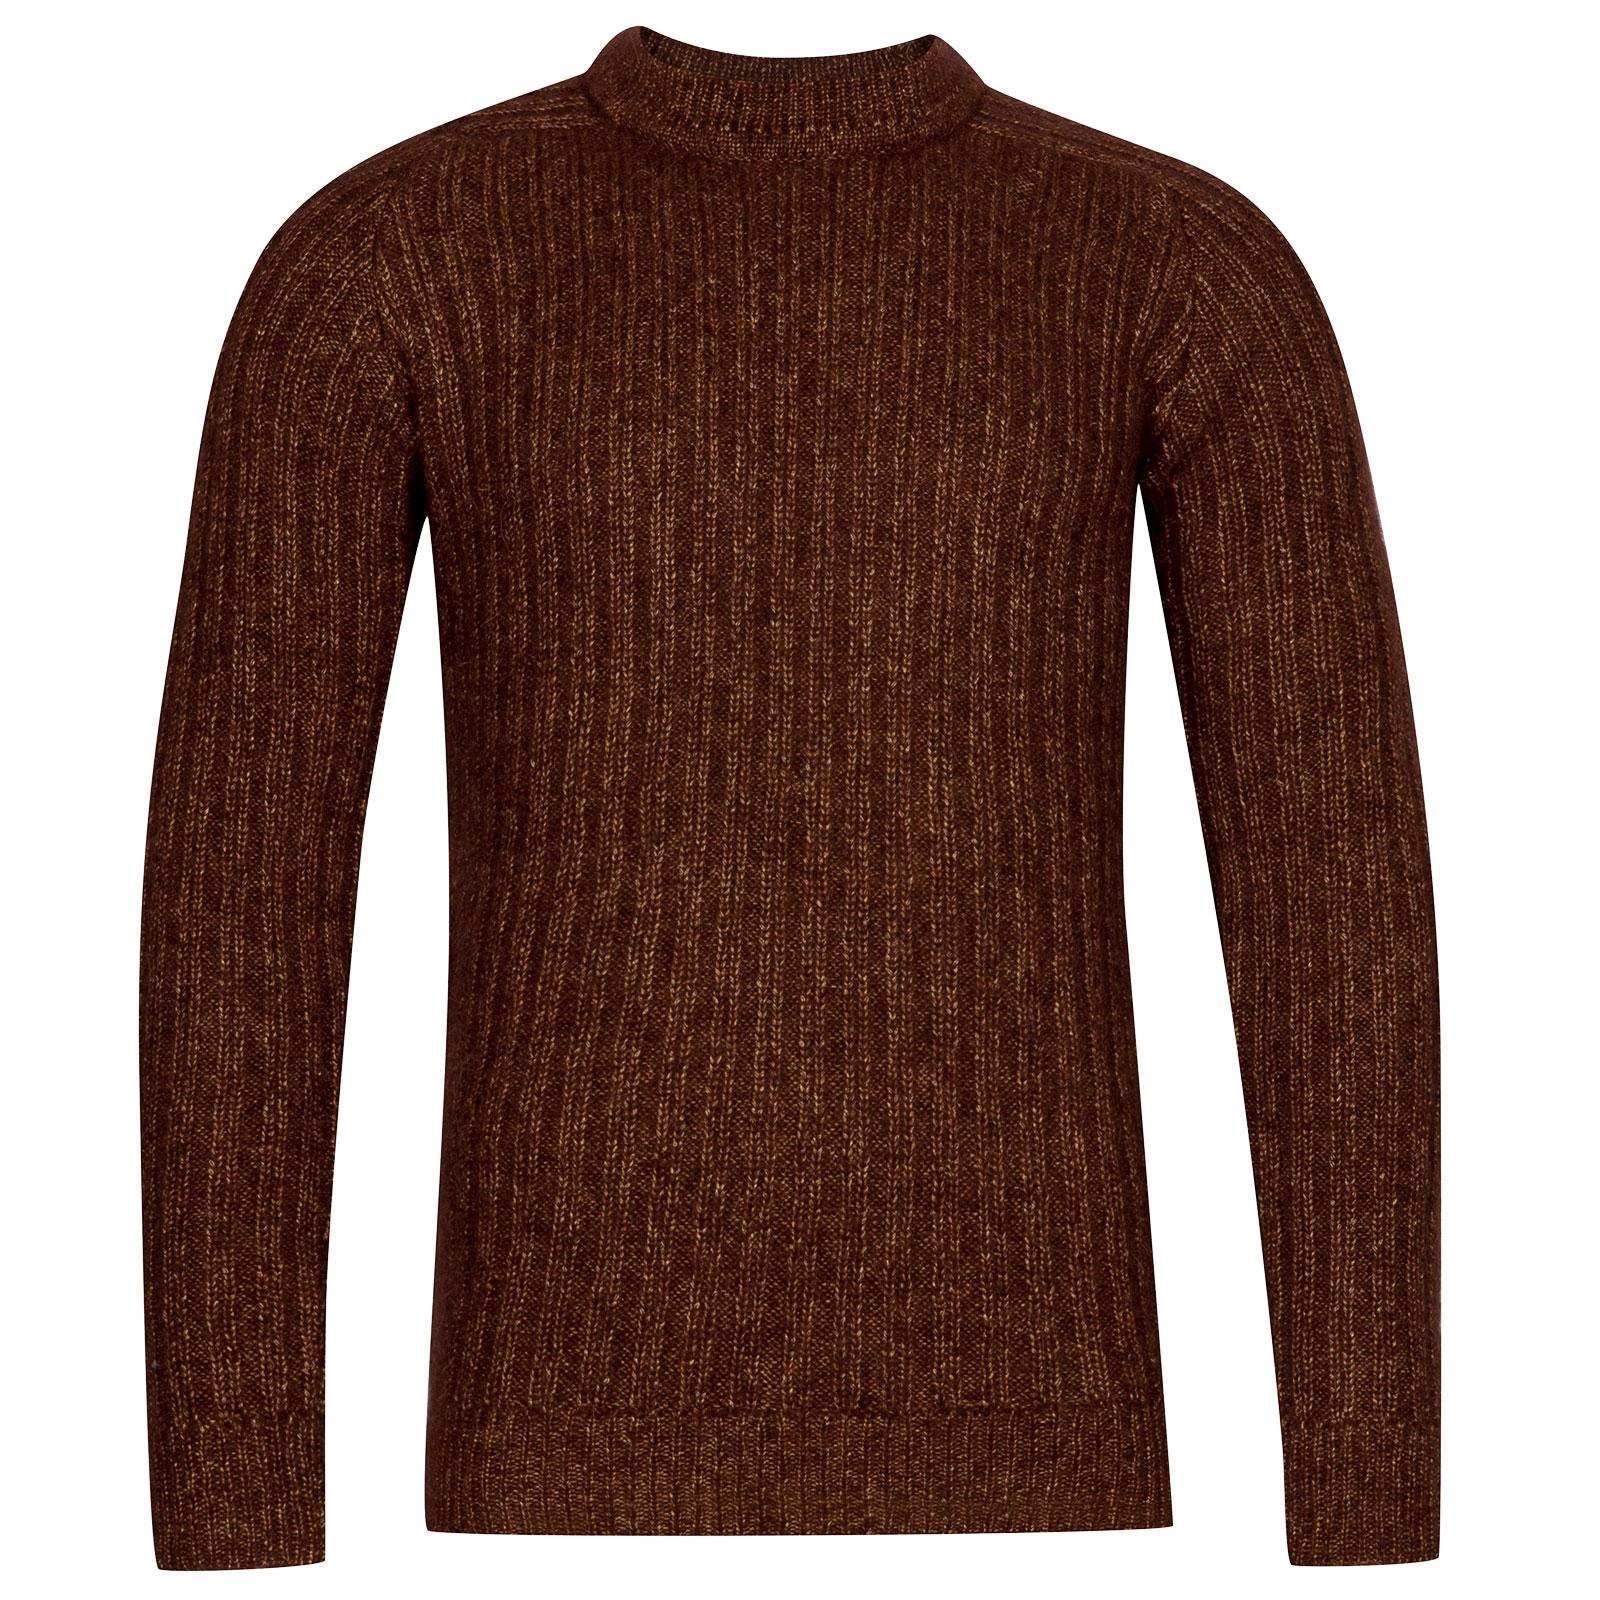 John Smedley Salke Viscose Blend Pullover In Bronze-M